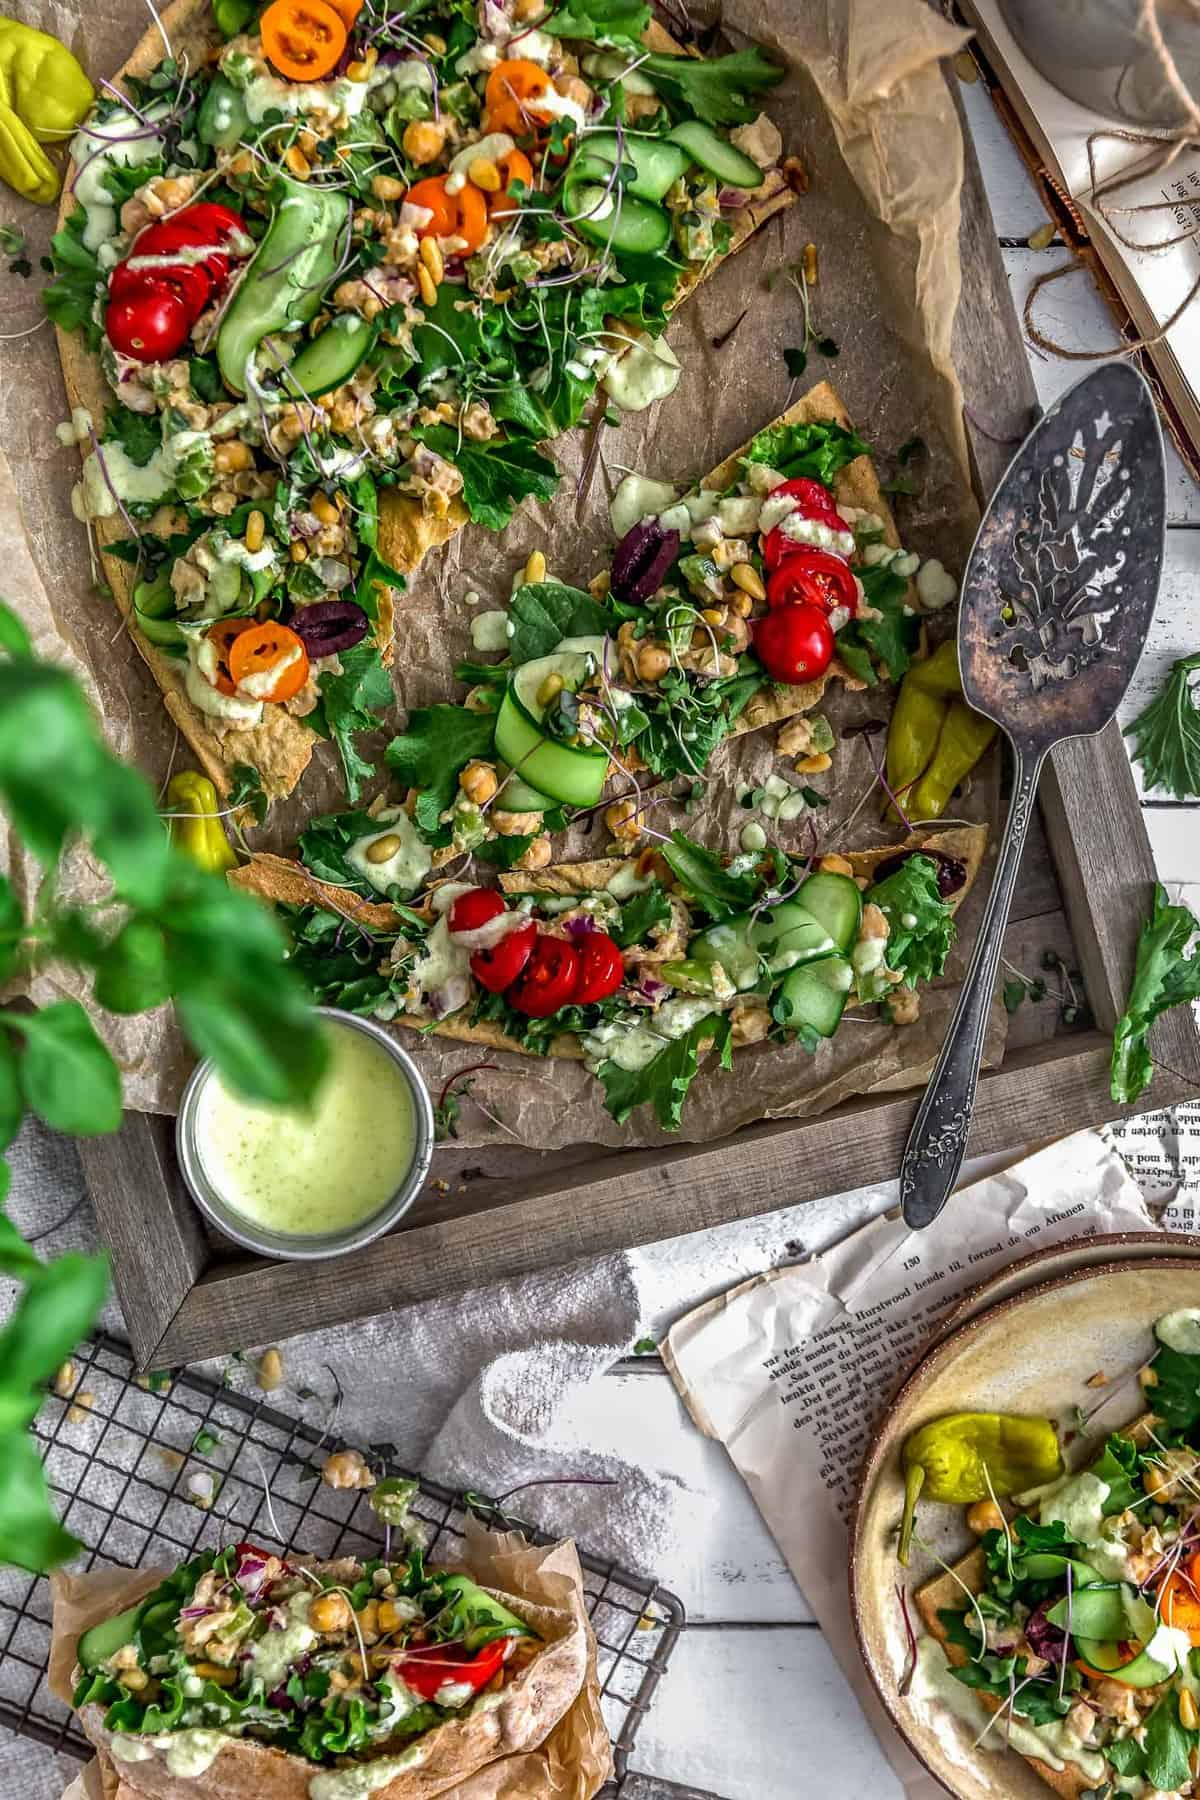 Vegan Greek Chickpea Salad, vegan chickpea salad, vegan salad, Greek, flatbread, salad, plant based, vegan, vegetarian, whole food plant based, gluten free, recipe, wfpb, healthy, healthy vegan, oil free, no refined sugar, no oil, refined sugar free, dairy free, dinner party, entertaining, dinner, lunch, side, oil free salad, oil free sauce, easy recipe, appetizer, food photography, photography, salad photography, flatlay